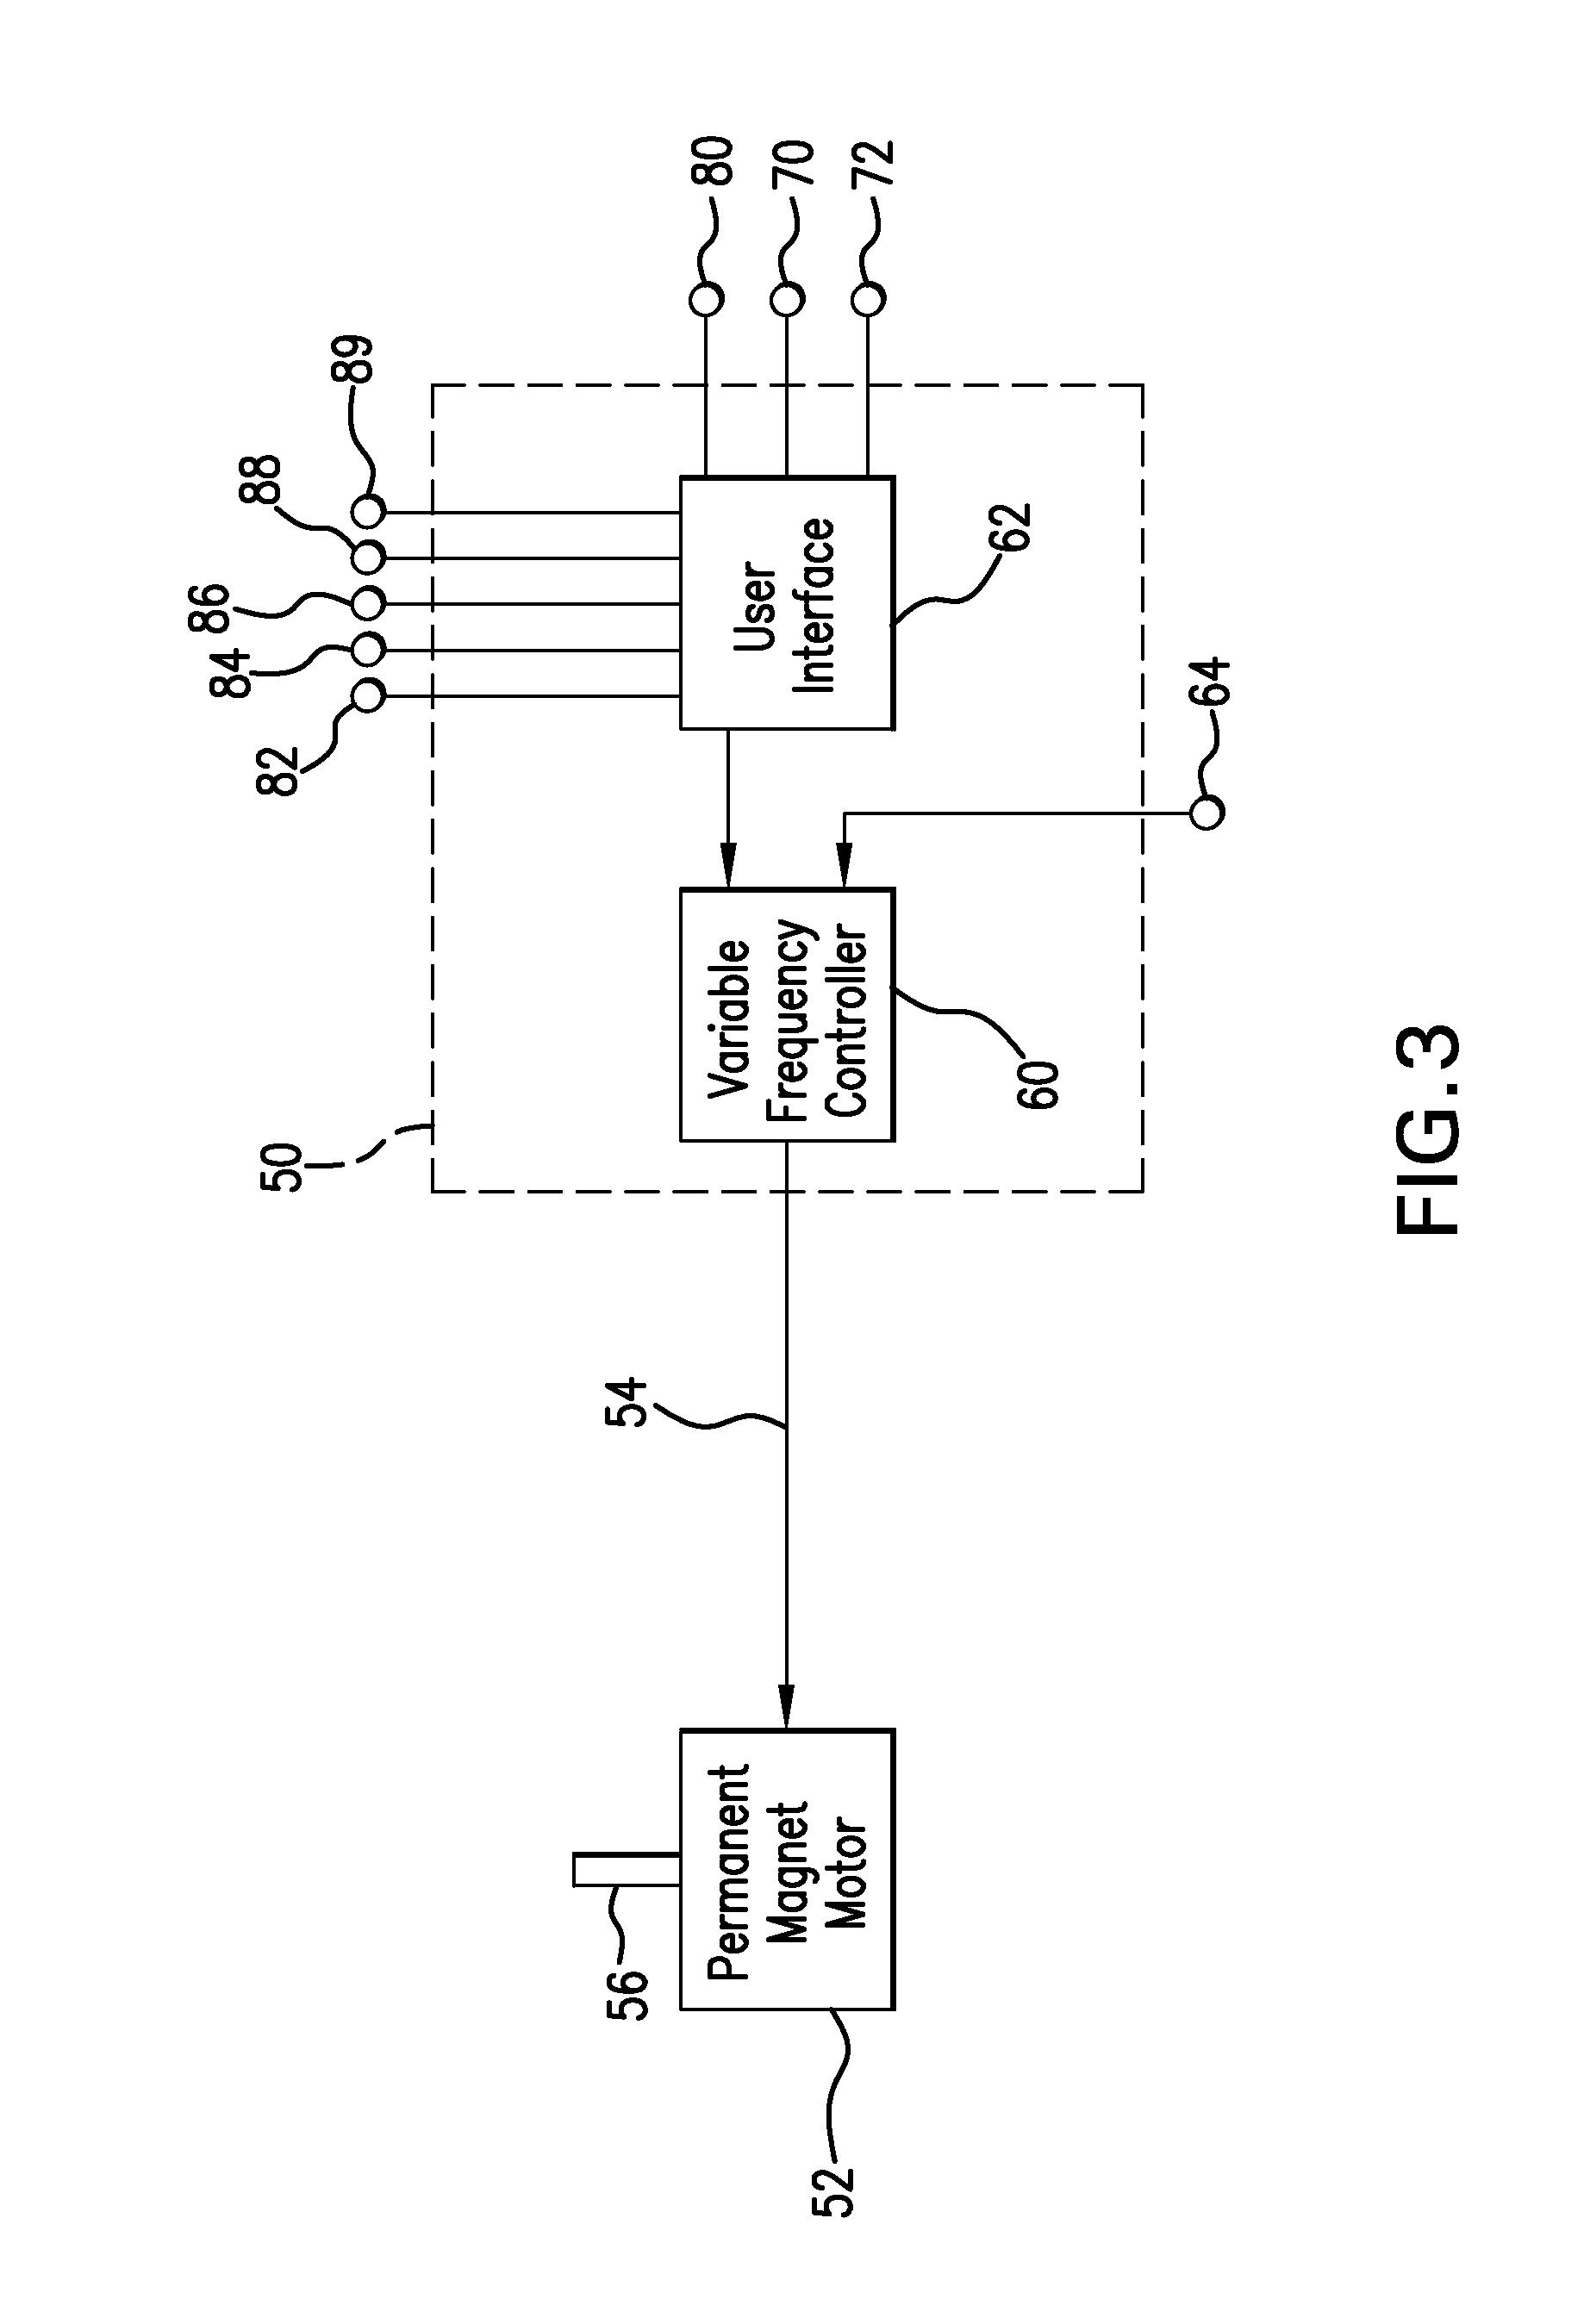 bac vibration switch wiring diagram